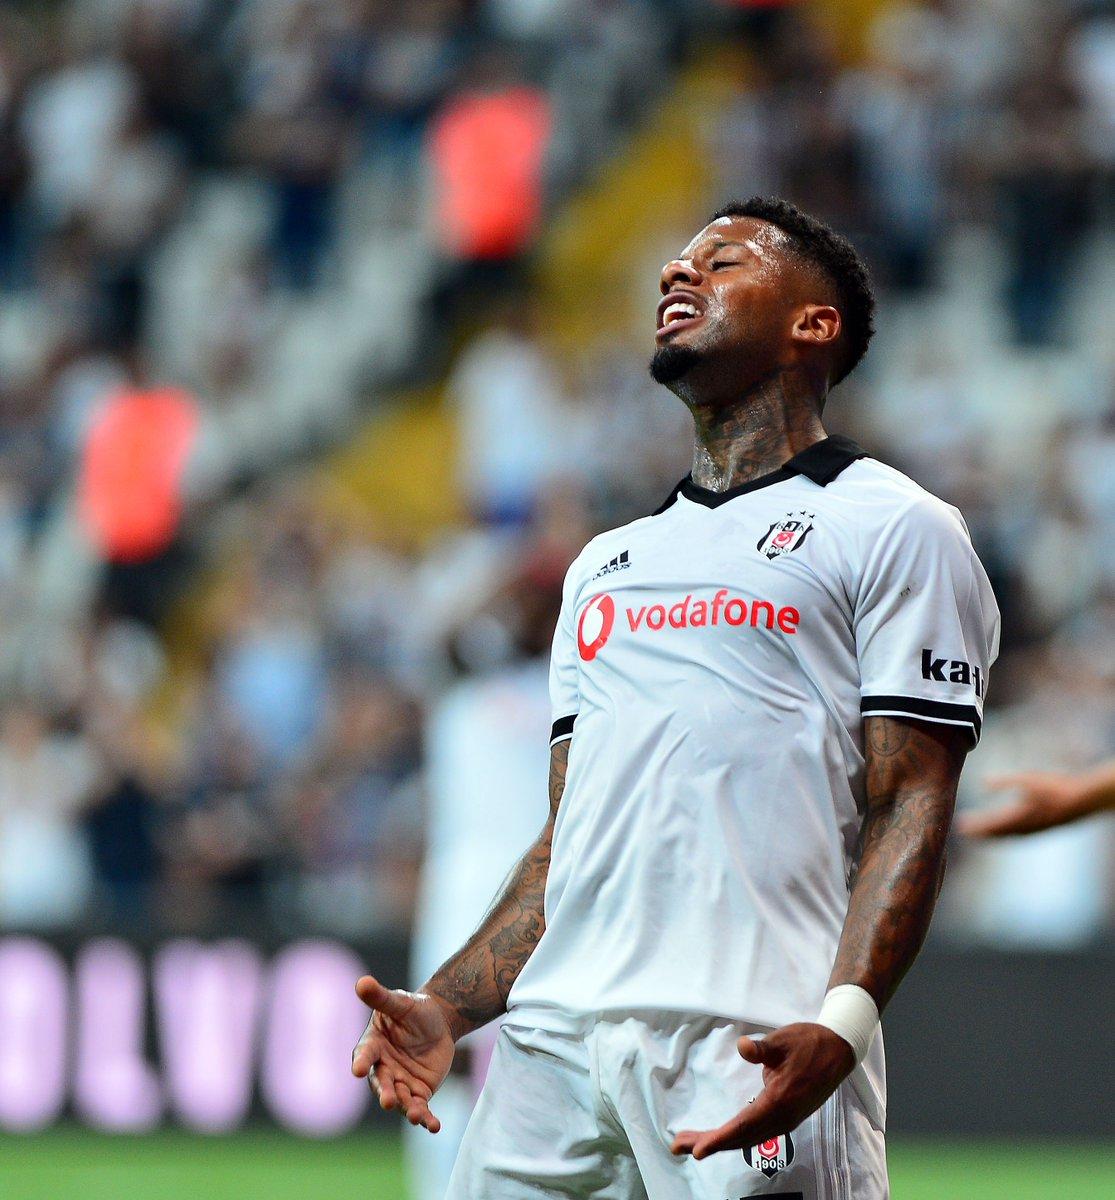 RT @forzabesiktas: Hedefe odaklan... #ZafereKanatlan #BeşiktaşBizim #BuSevdaBizim  #Beşiktaş https://t.co/Hlkn3P28QK